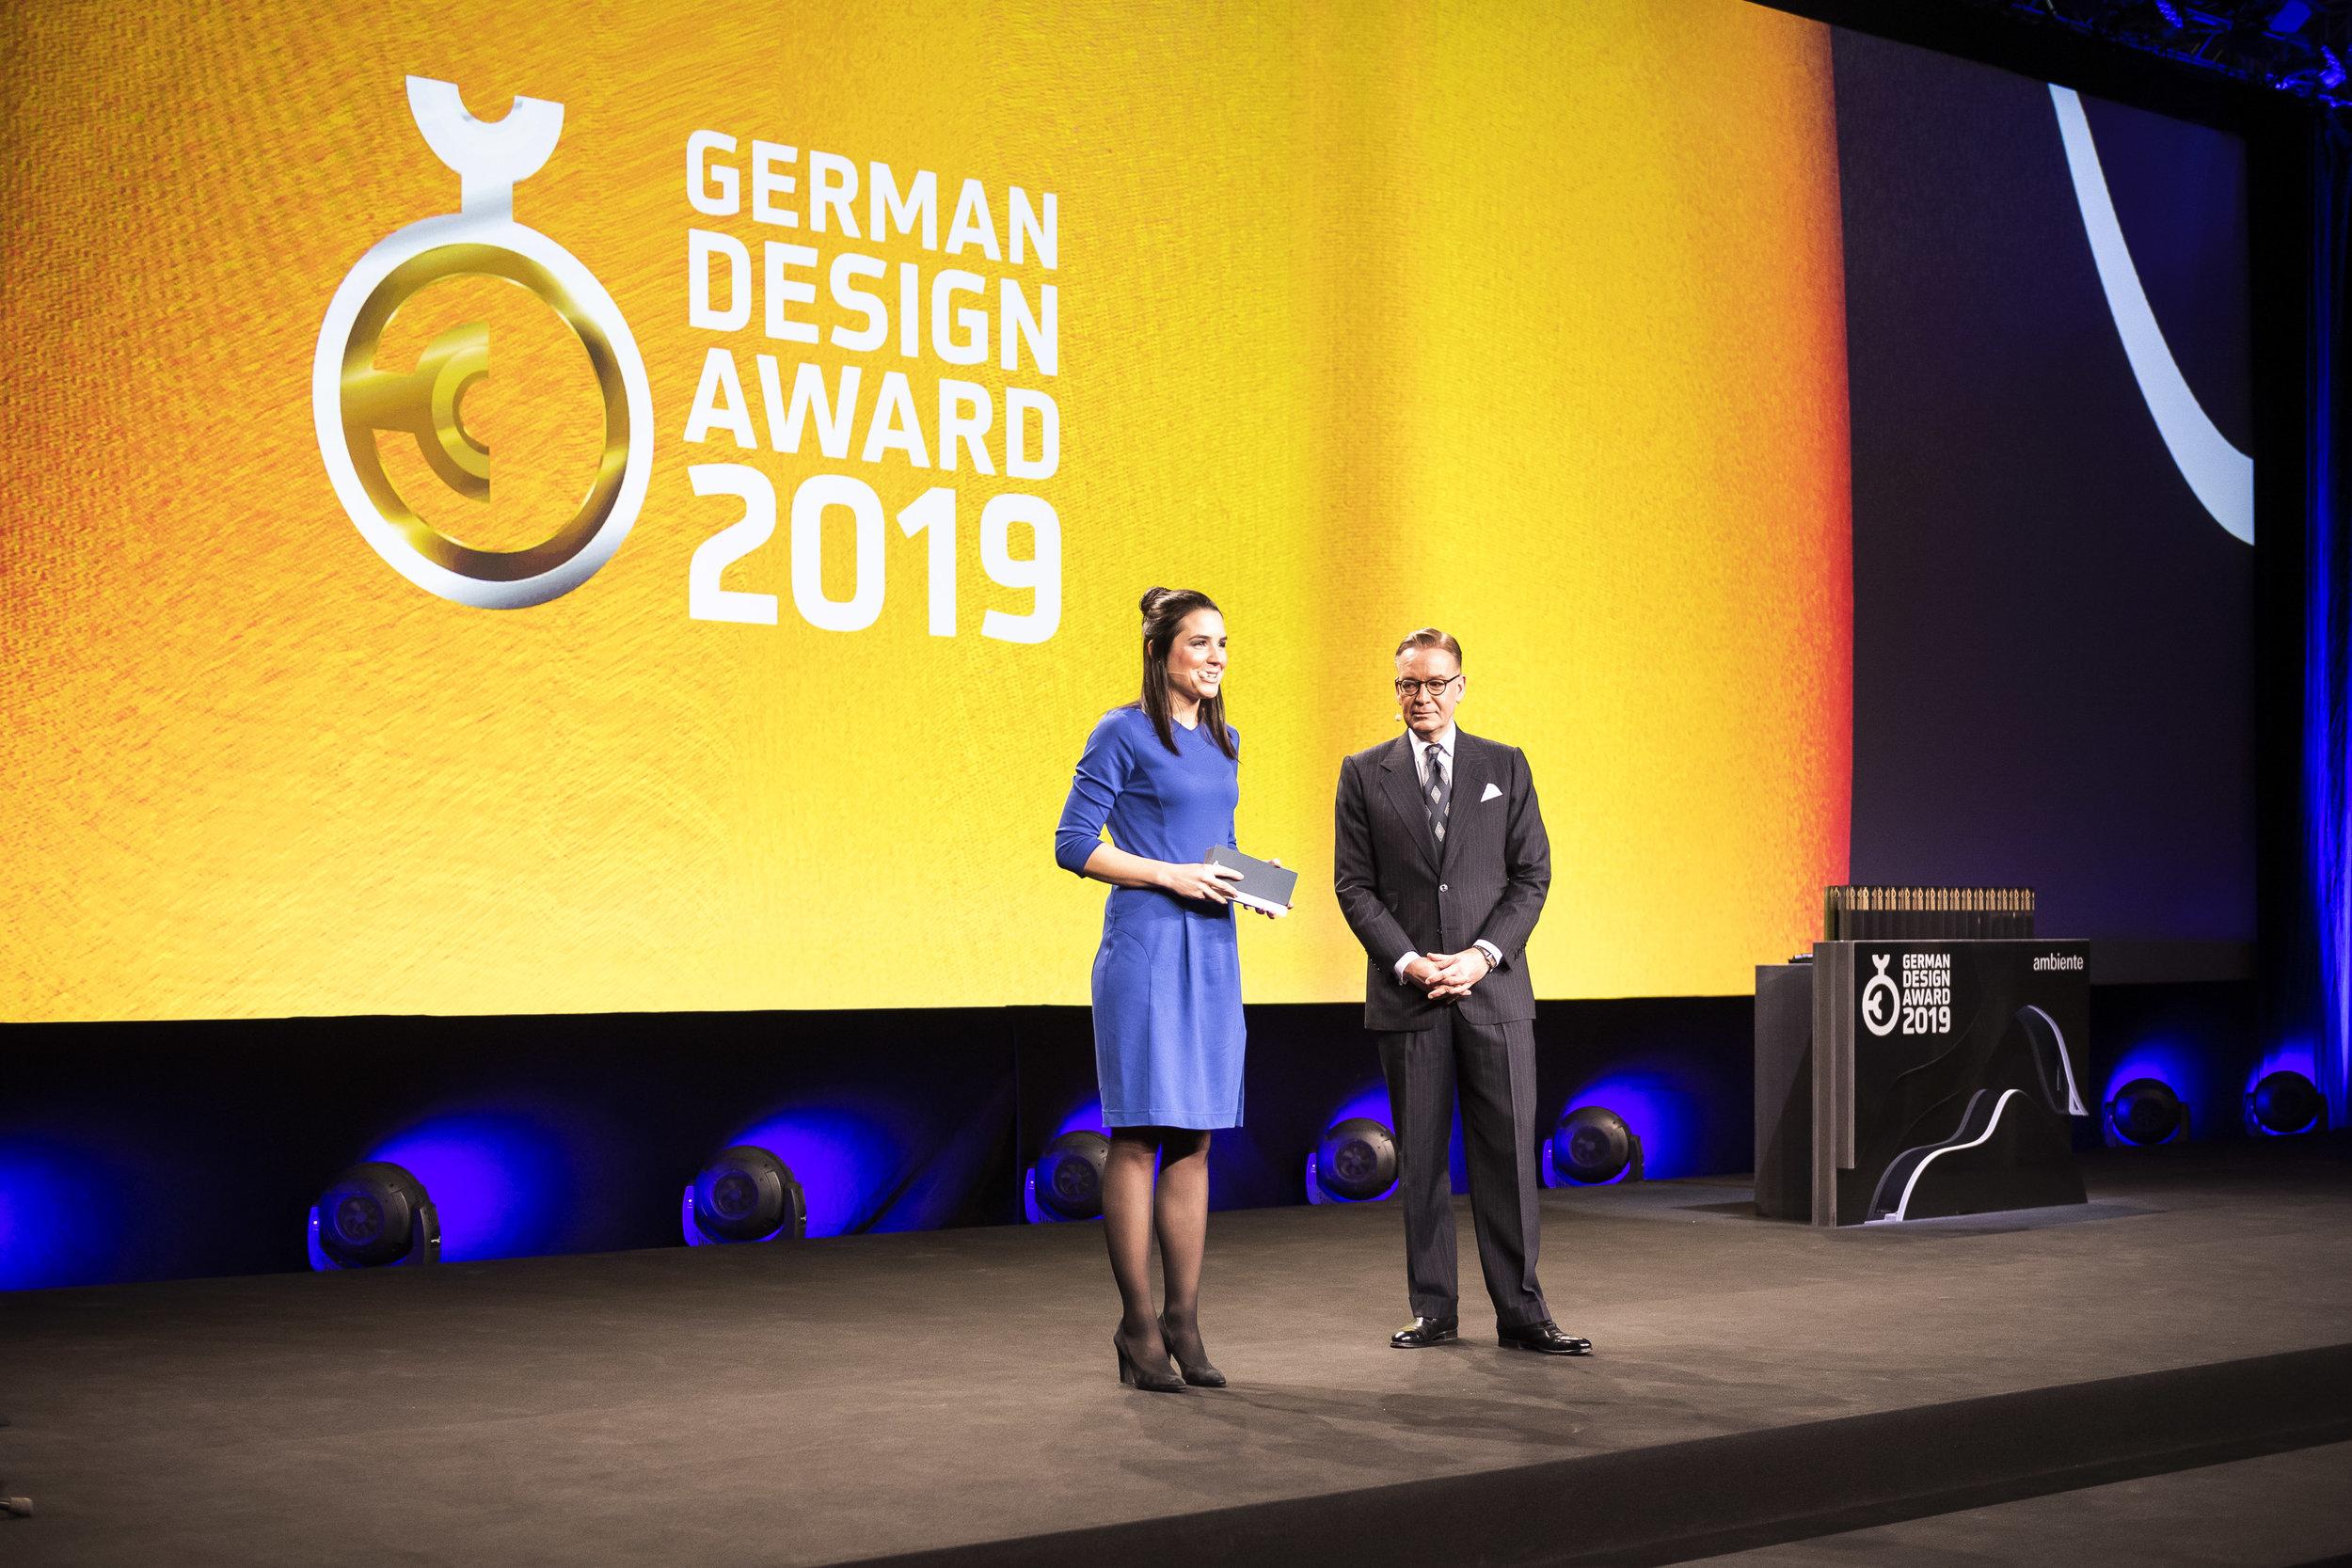 GDA2019_Preisverleihung_Verleihung_German_Design_Award_2019_Innen & Architektur_Studer.jpg